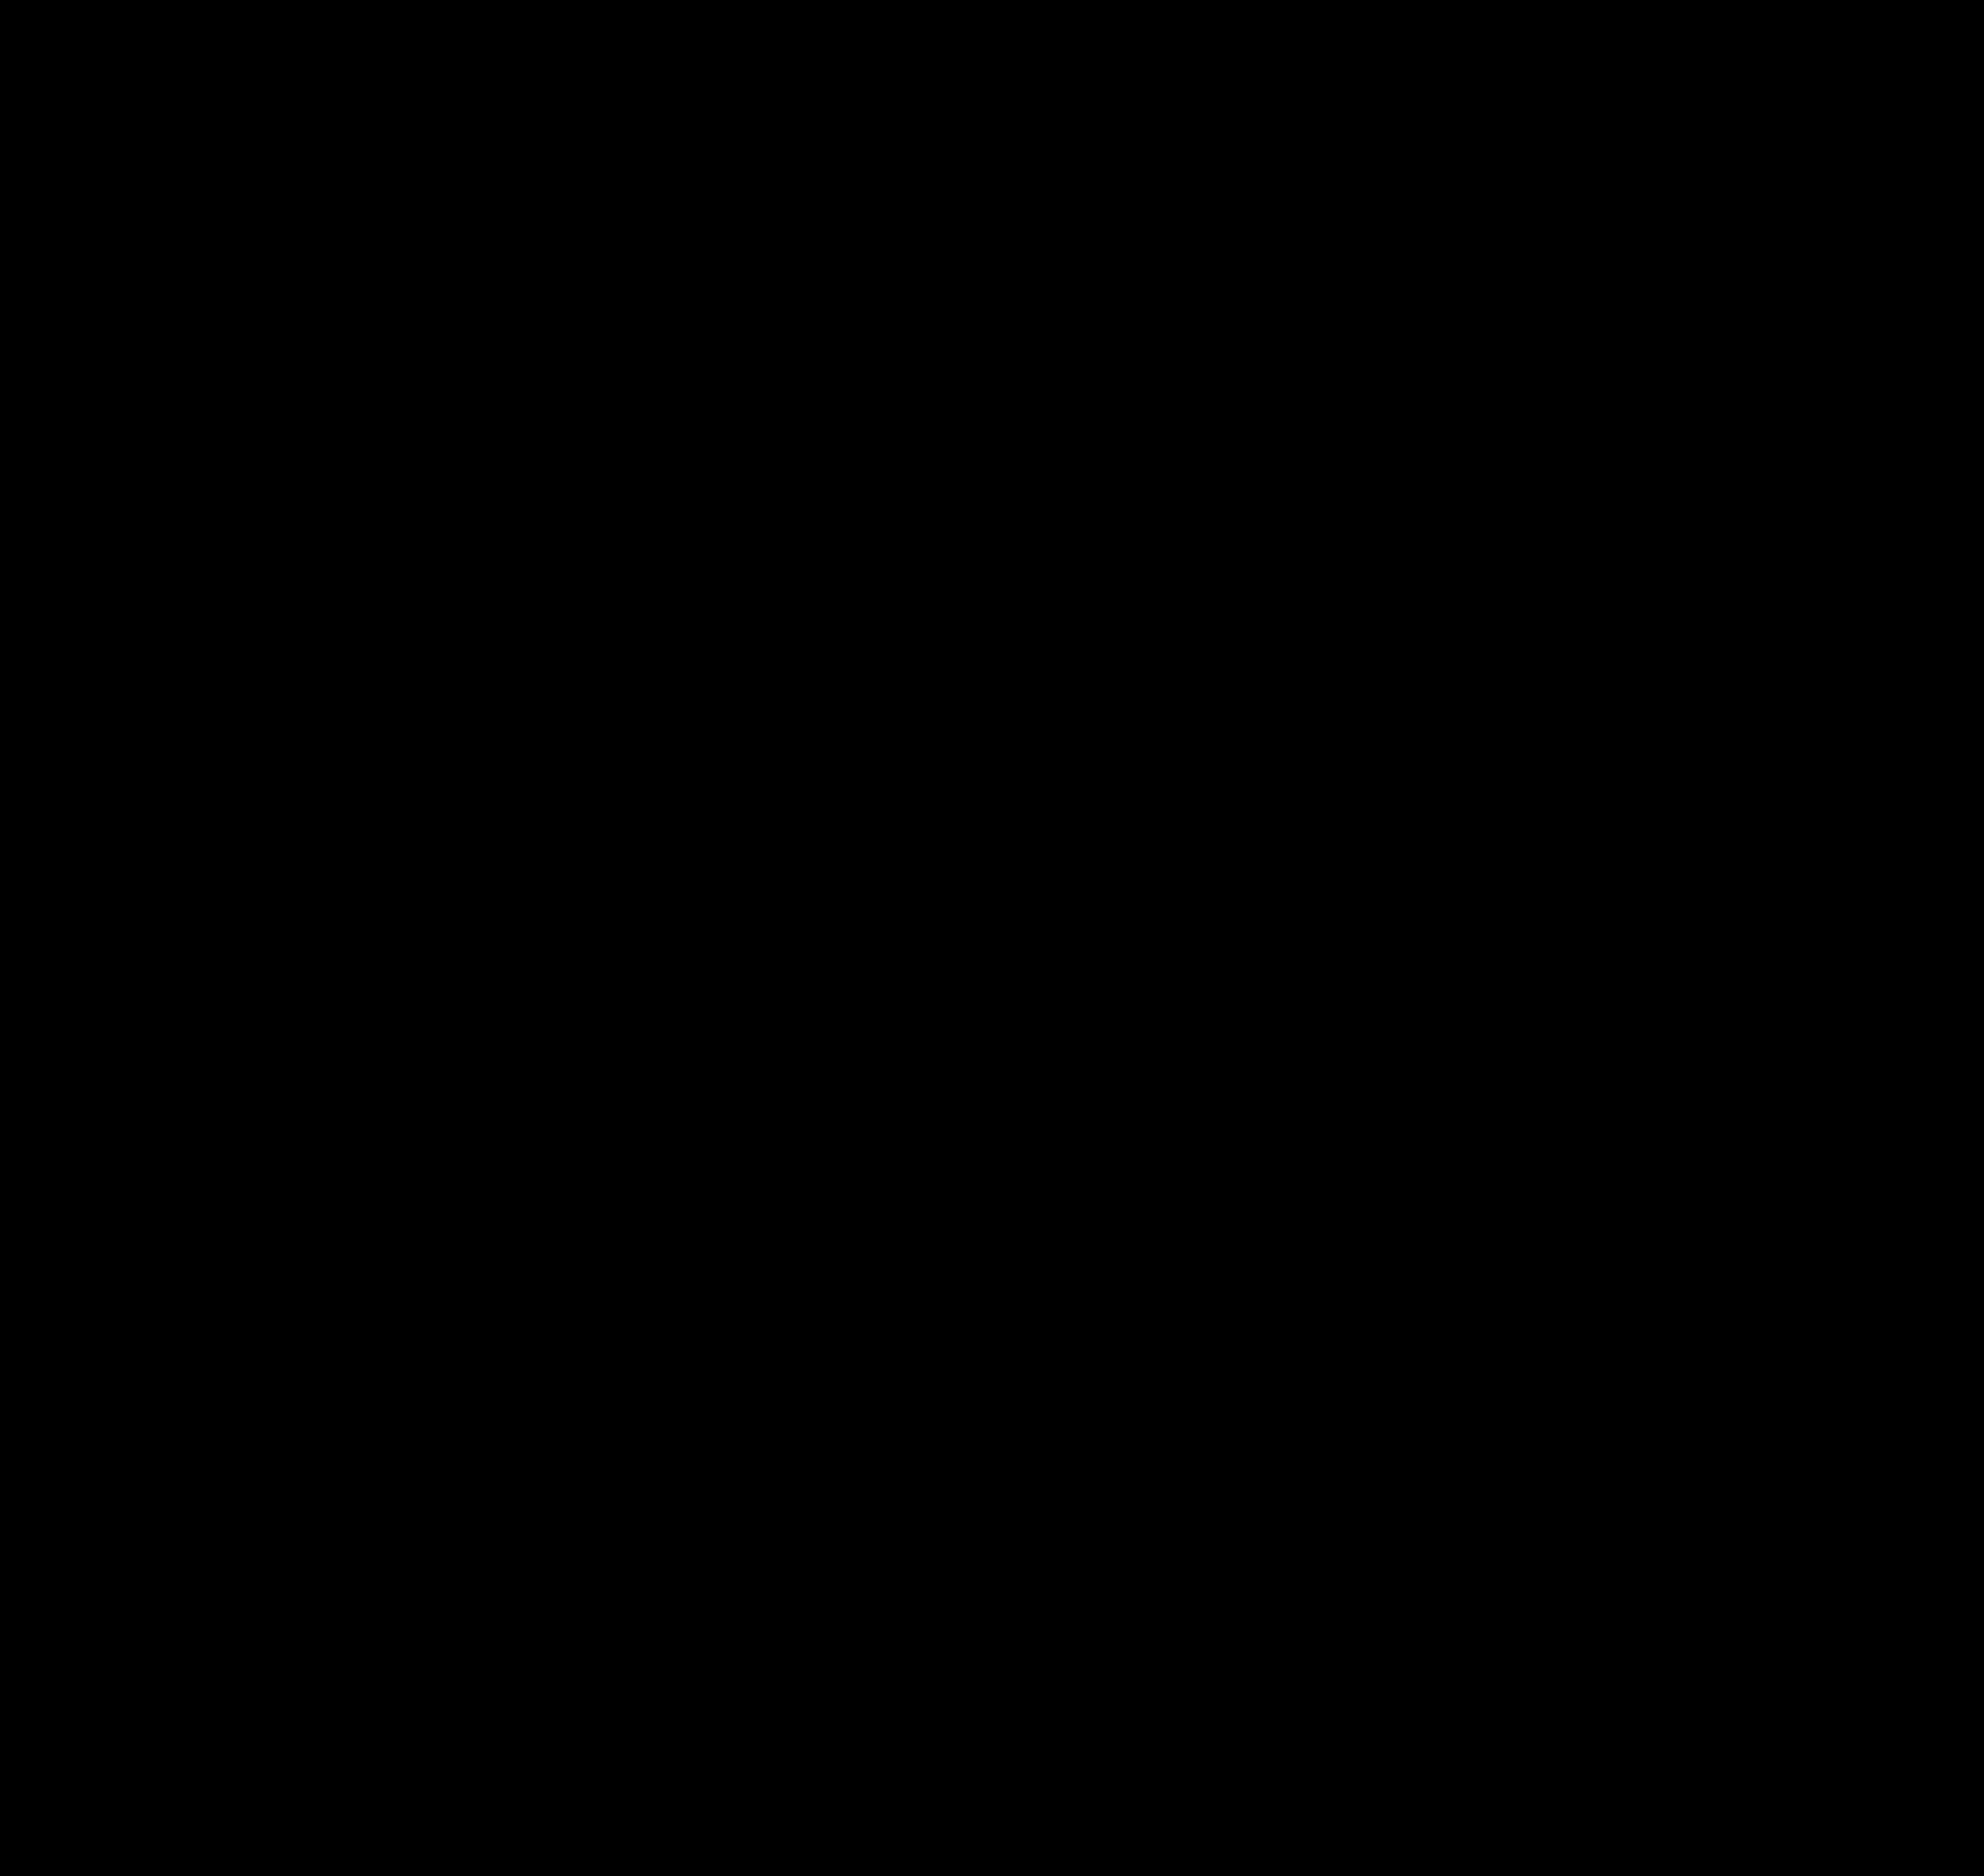 железная дорога картинка пнг сюжетные